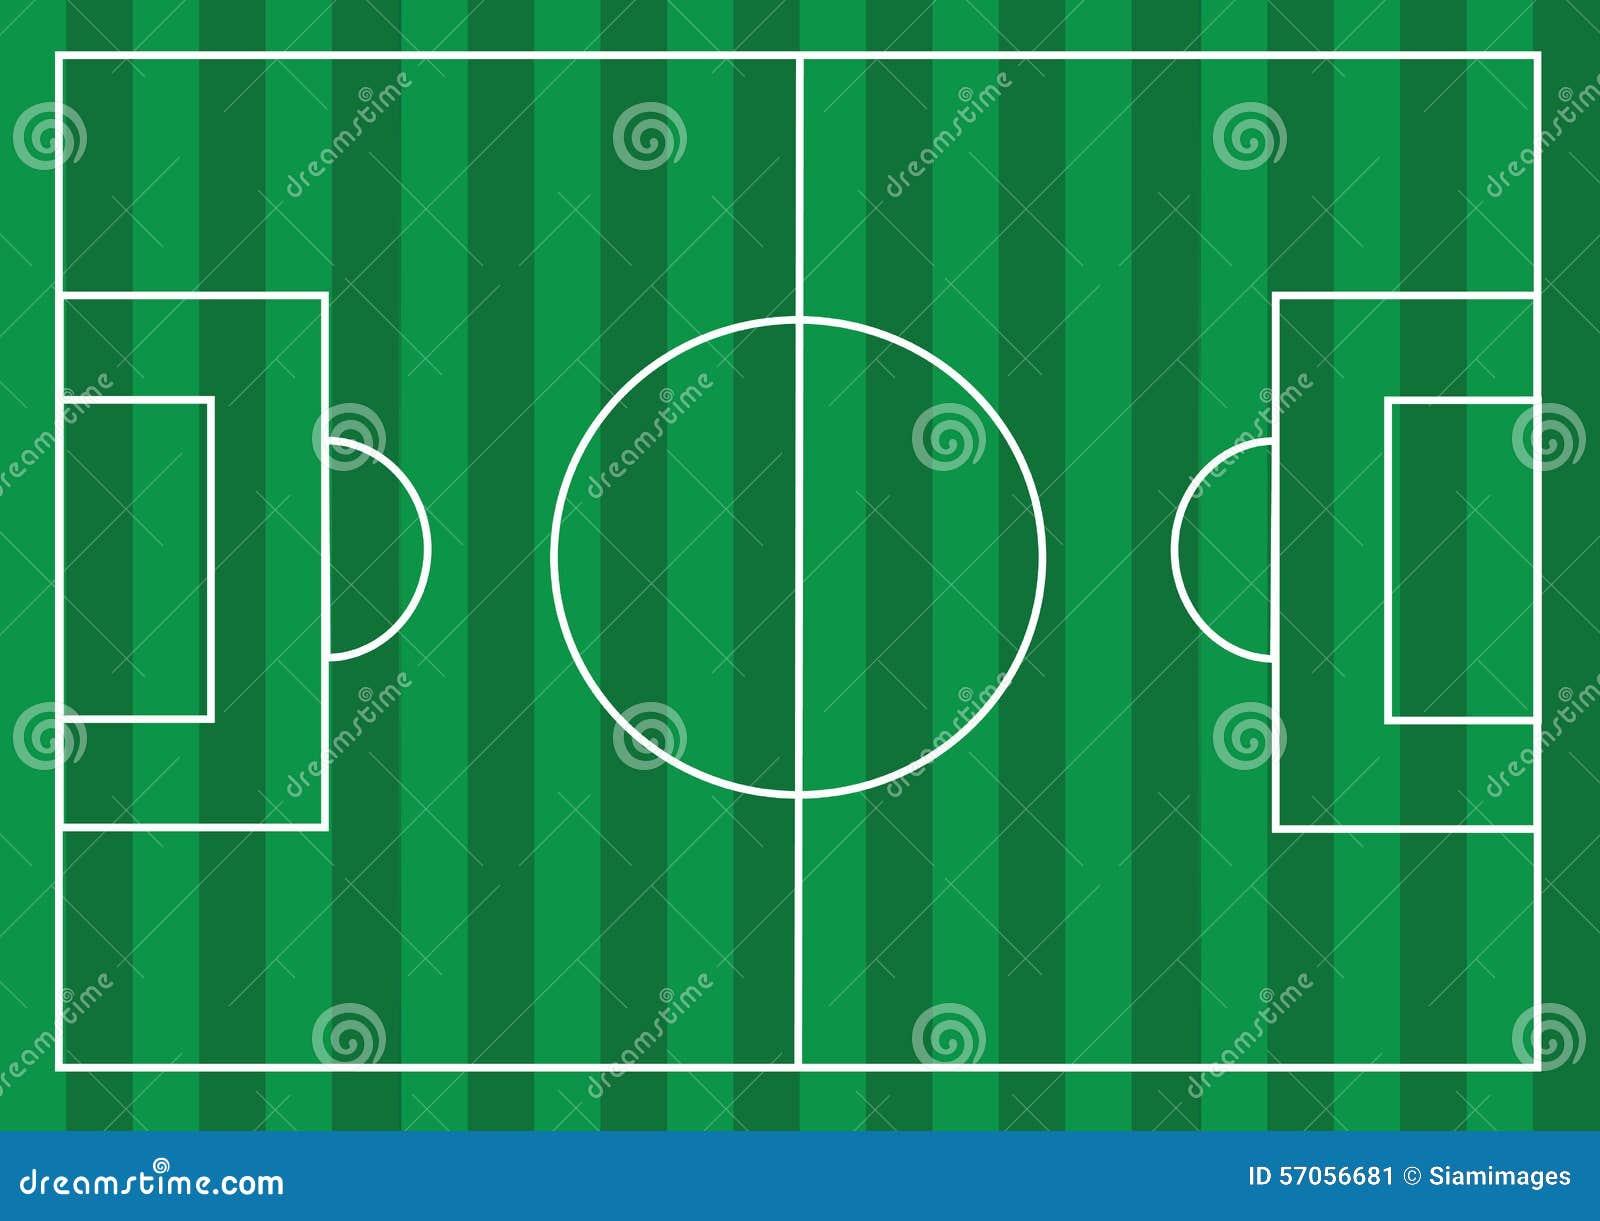 Voetbalgebied of gebied van het Voetbal het geweven gras